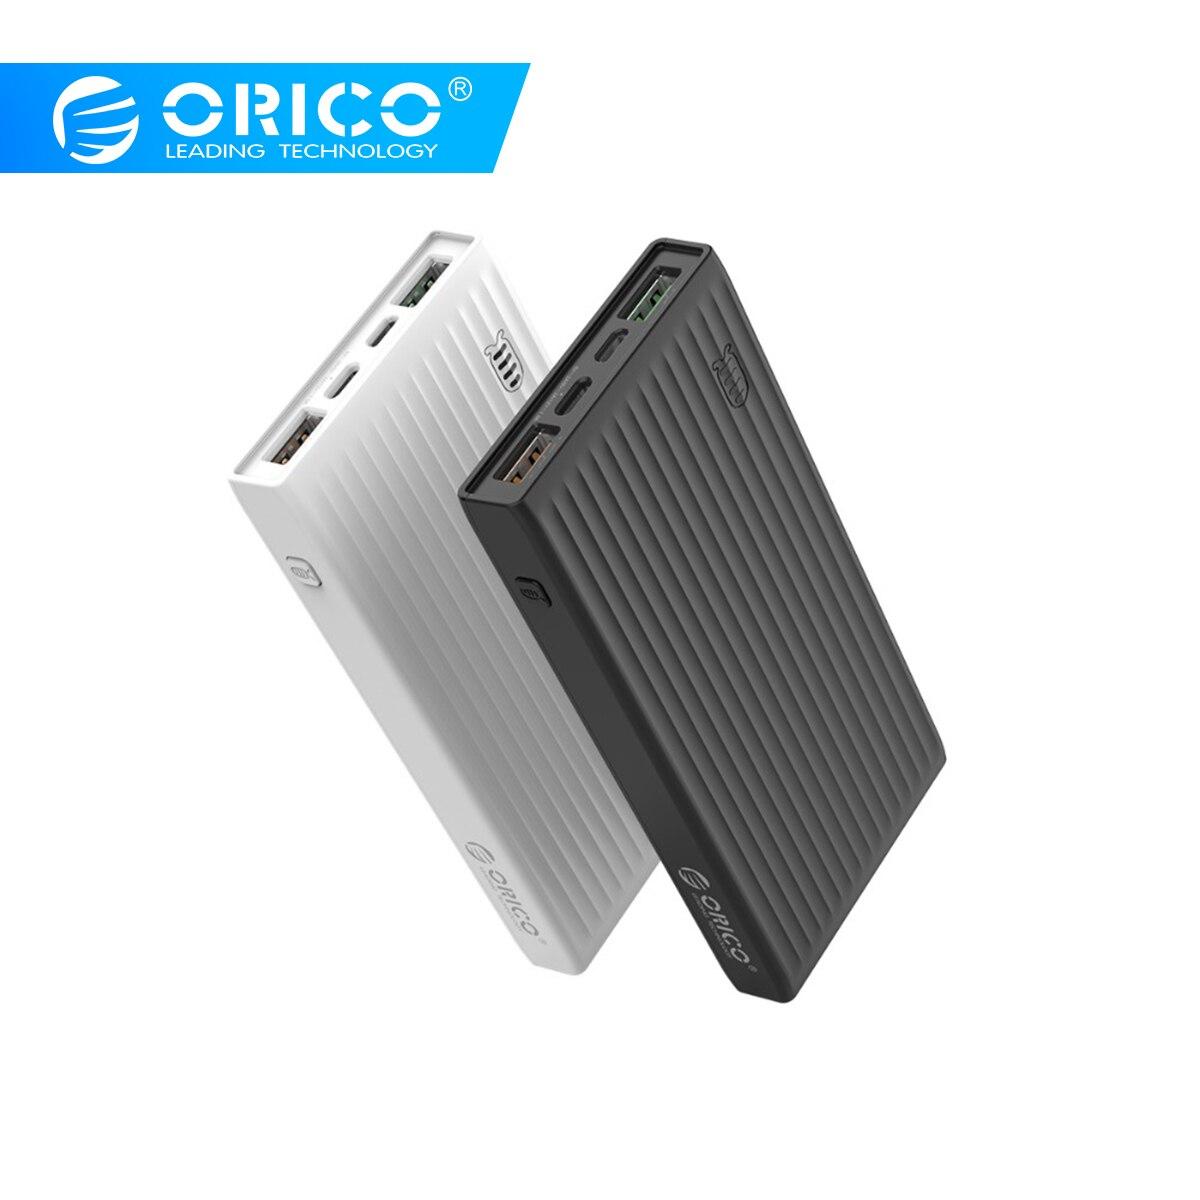 ORICO 20000mAh Universal Power Bank QC3.0 Quick Charge Dual-way Powerbank External Phone Backup Battery Charge For iPhone HuaweiORICO 20000mAh Universal Power Bank QC3.0 Quick Charge Dual-way Powerbank External Phone Backup Battery Charge For iPhone Huawei